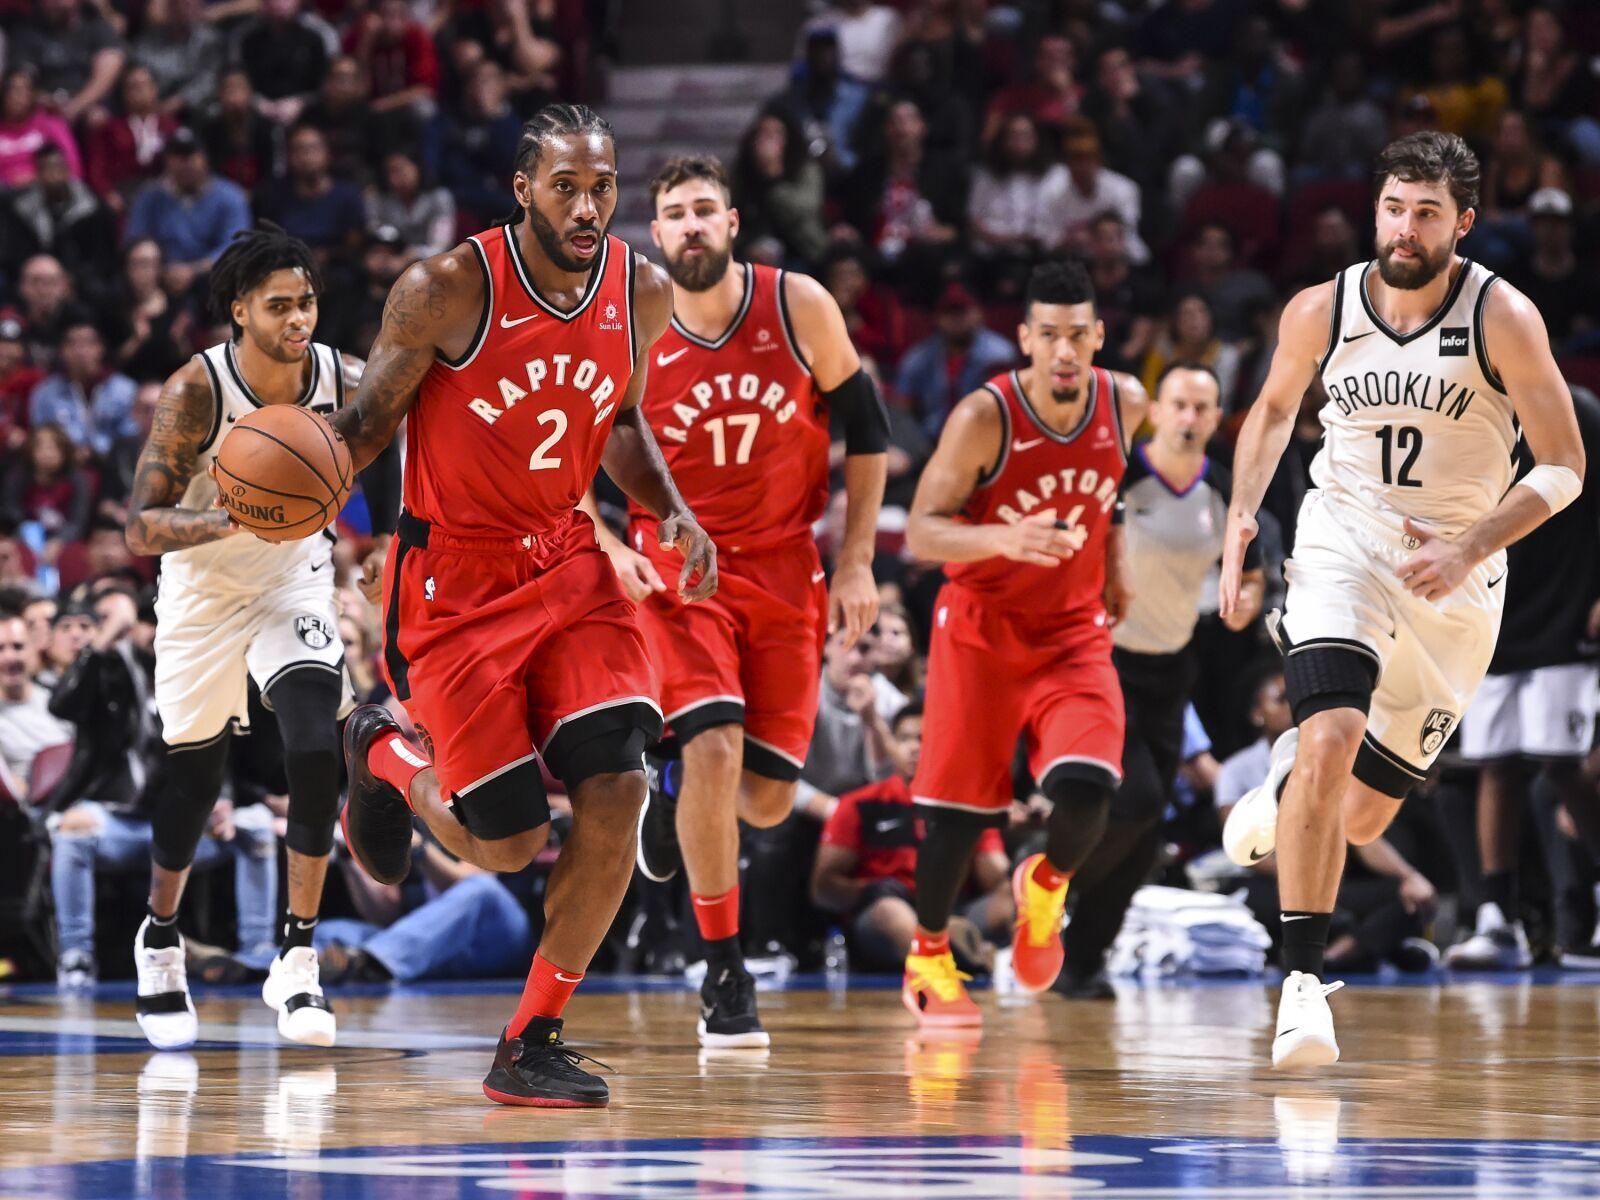 Toronto Raptors: Toronto Raptors: GMs Survey Mentions Our Team In